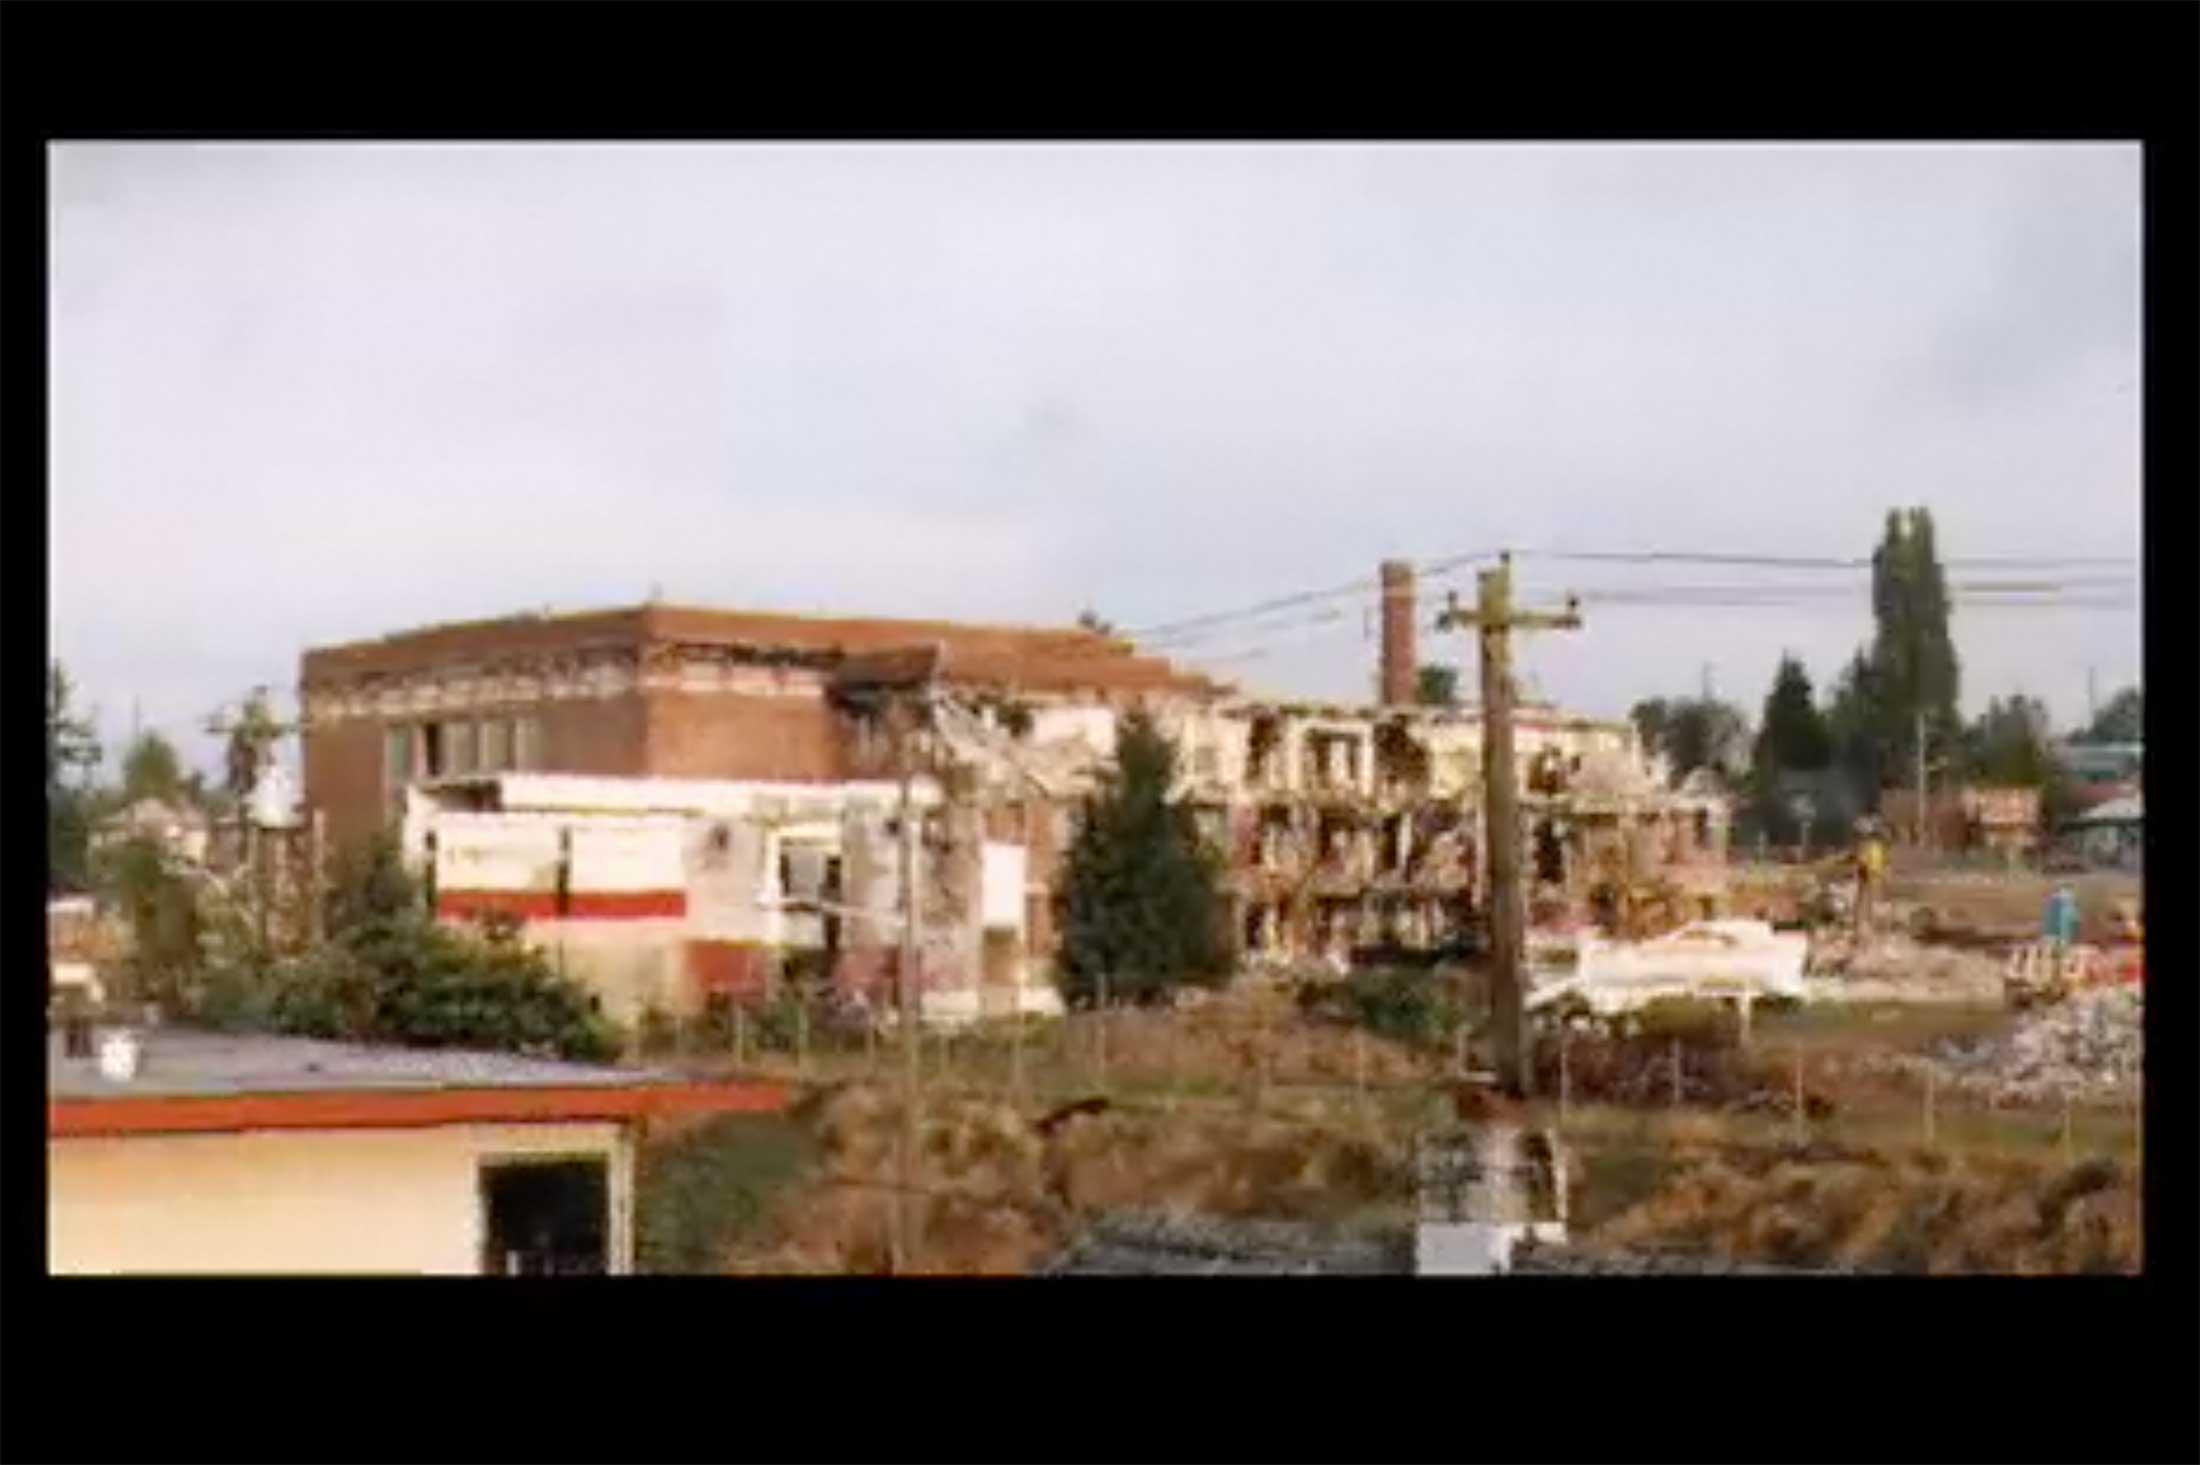 Ballard High School demolition and reconstruction.